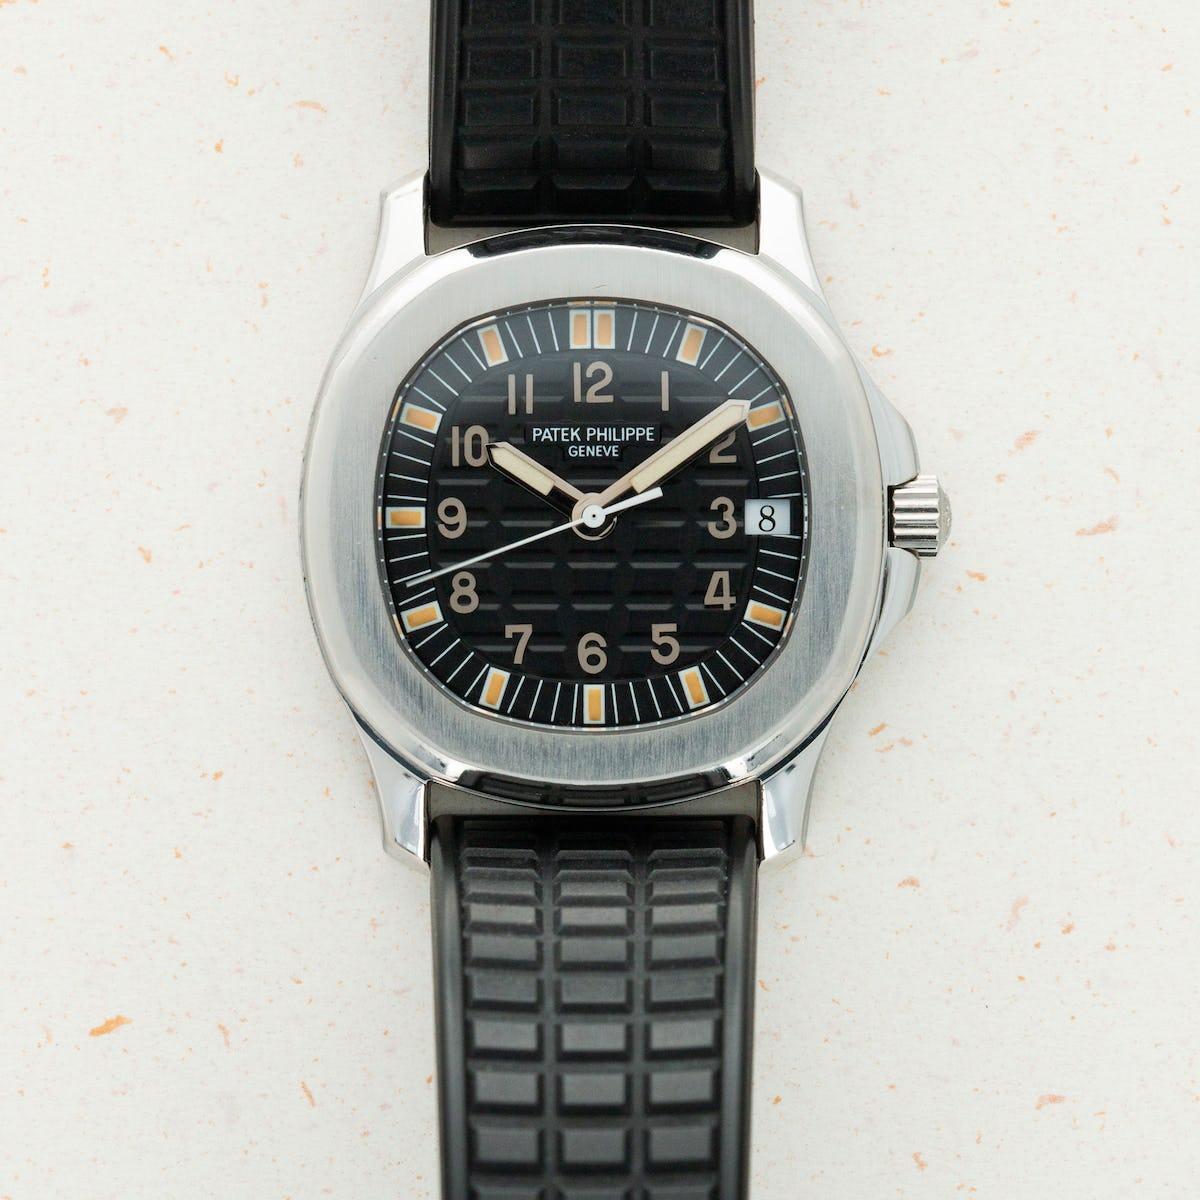 Thumbnail for Patek Philippe Aquanaut First Series 5060